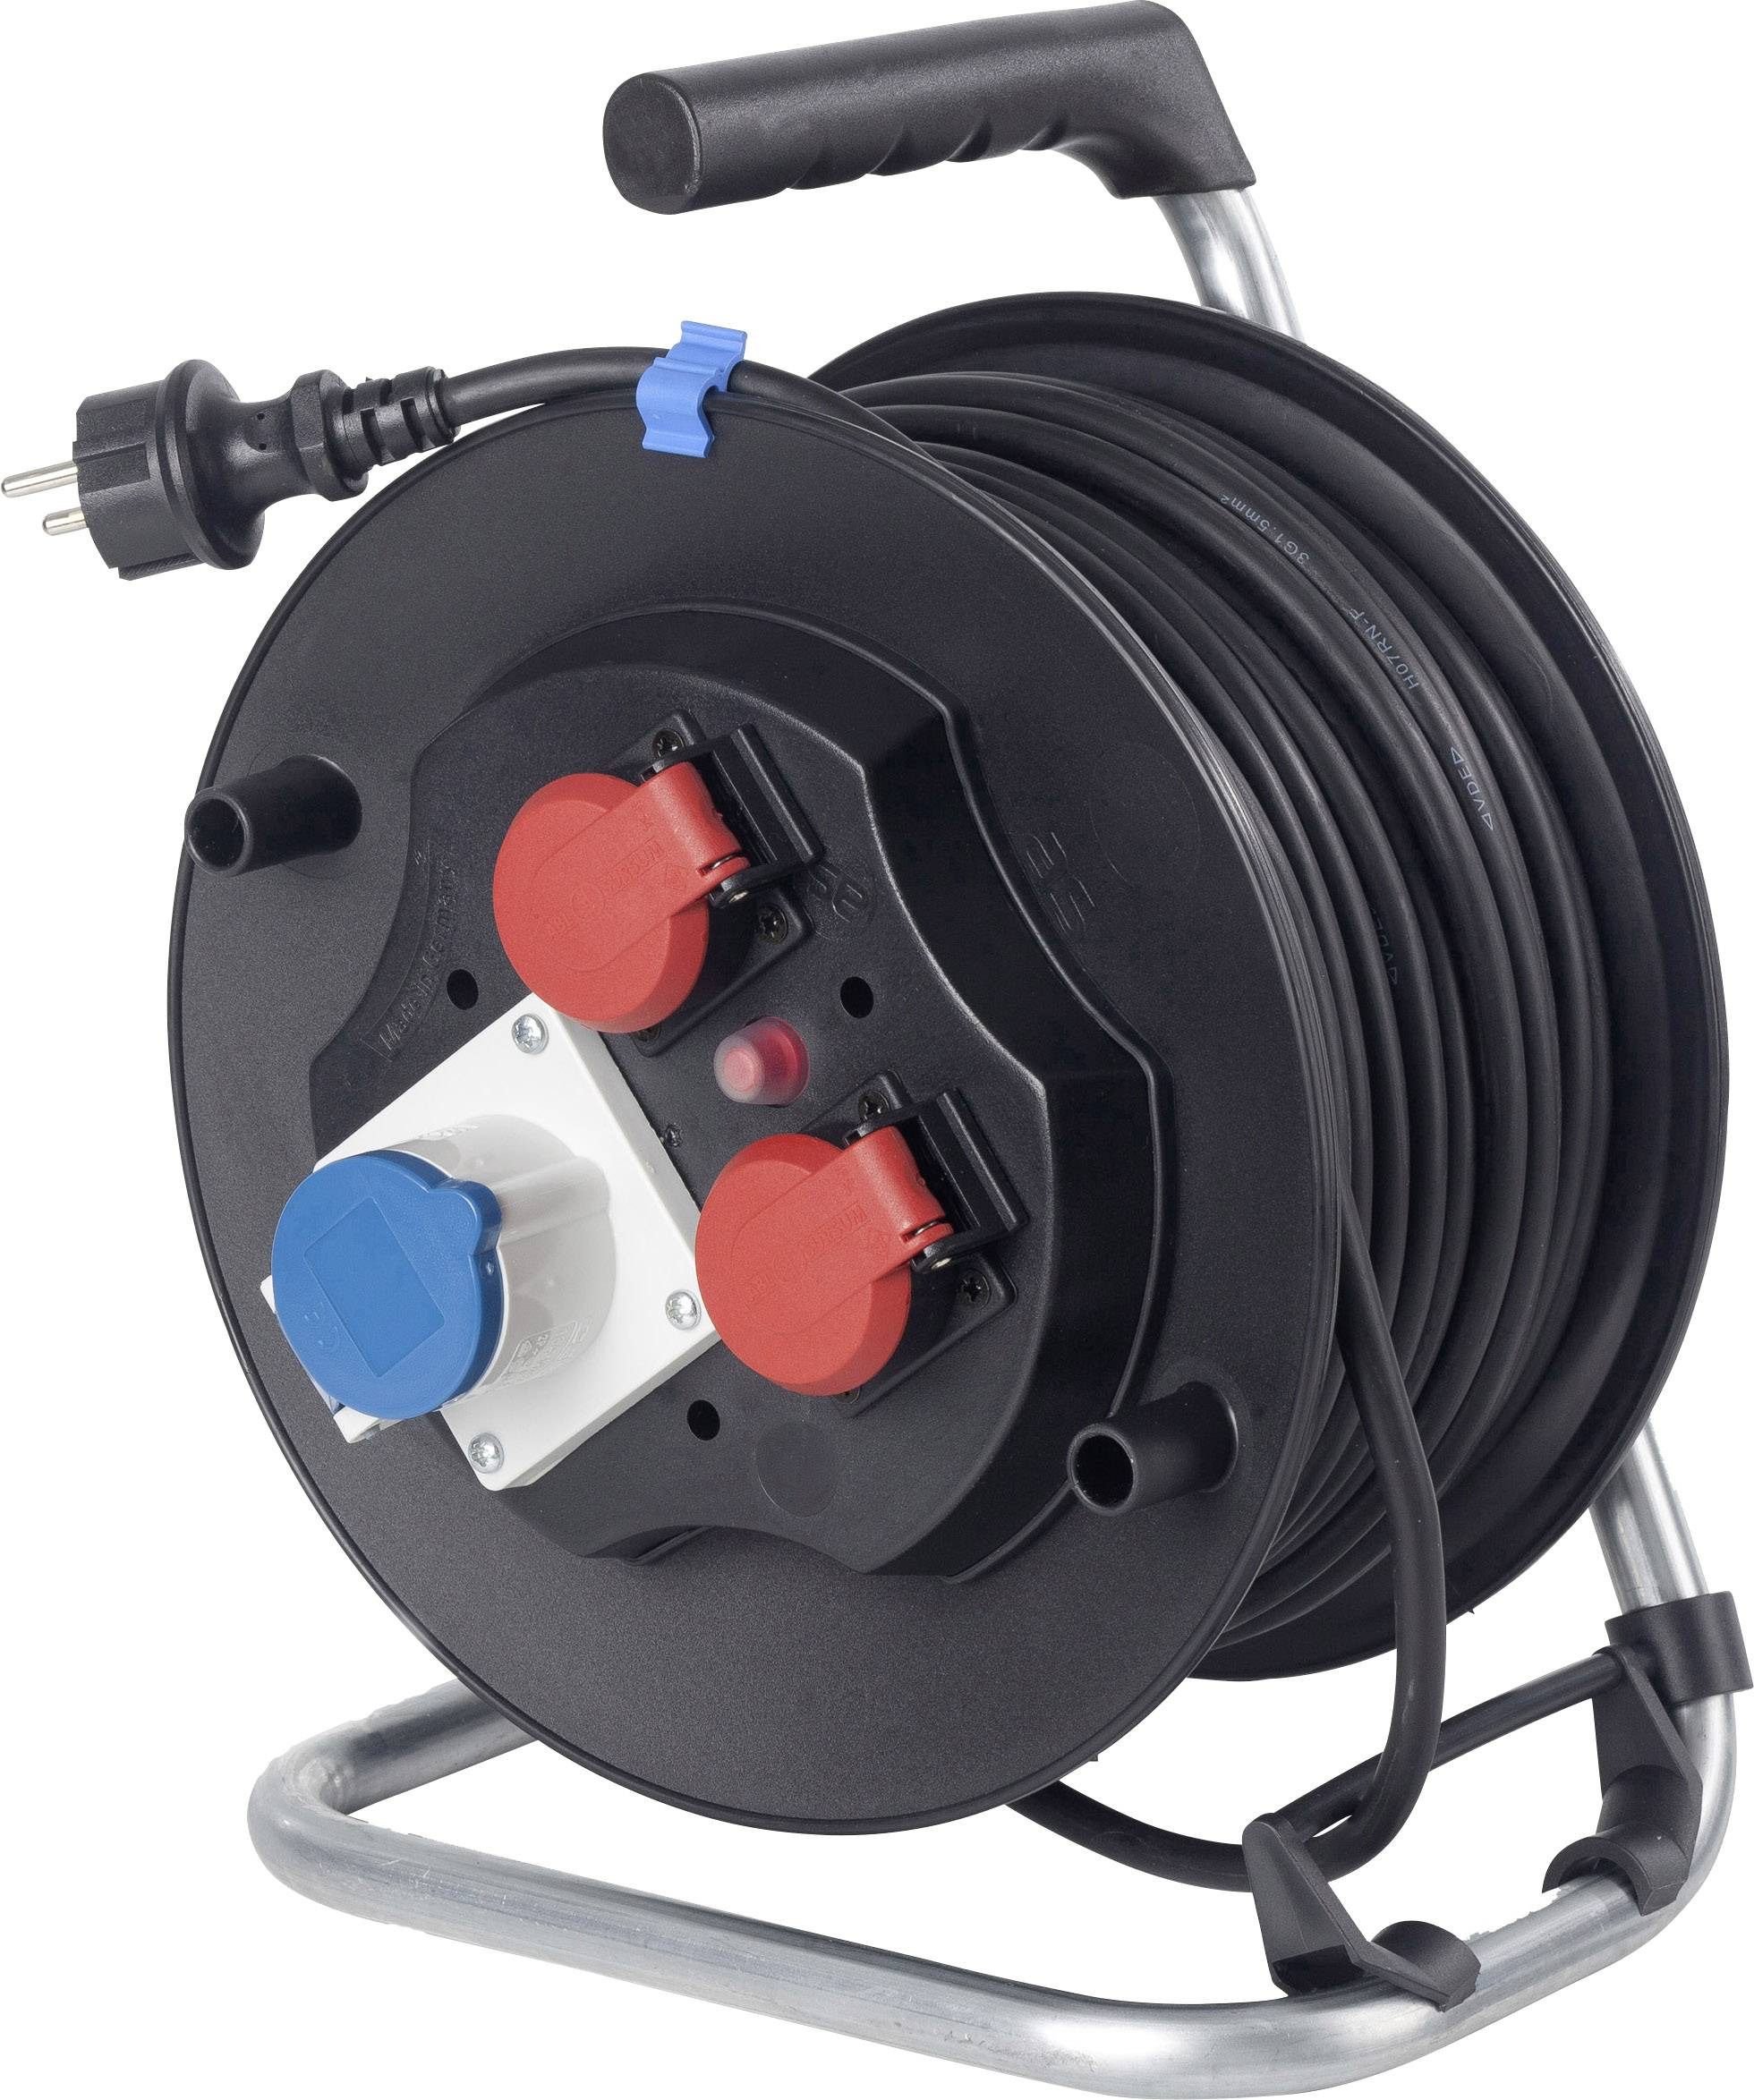 Kabelový buben AS Schwabe Camping CEE, 10174, 2 zásuvky, 1 CEE Cara zásuvka, 40 m, černá